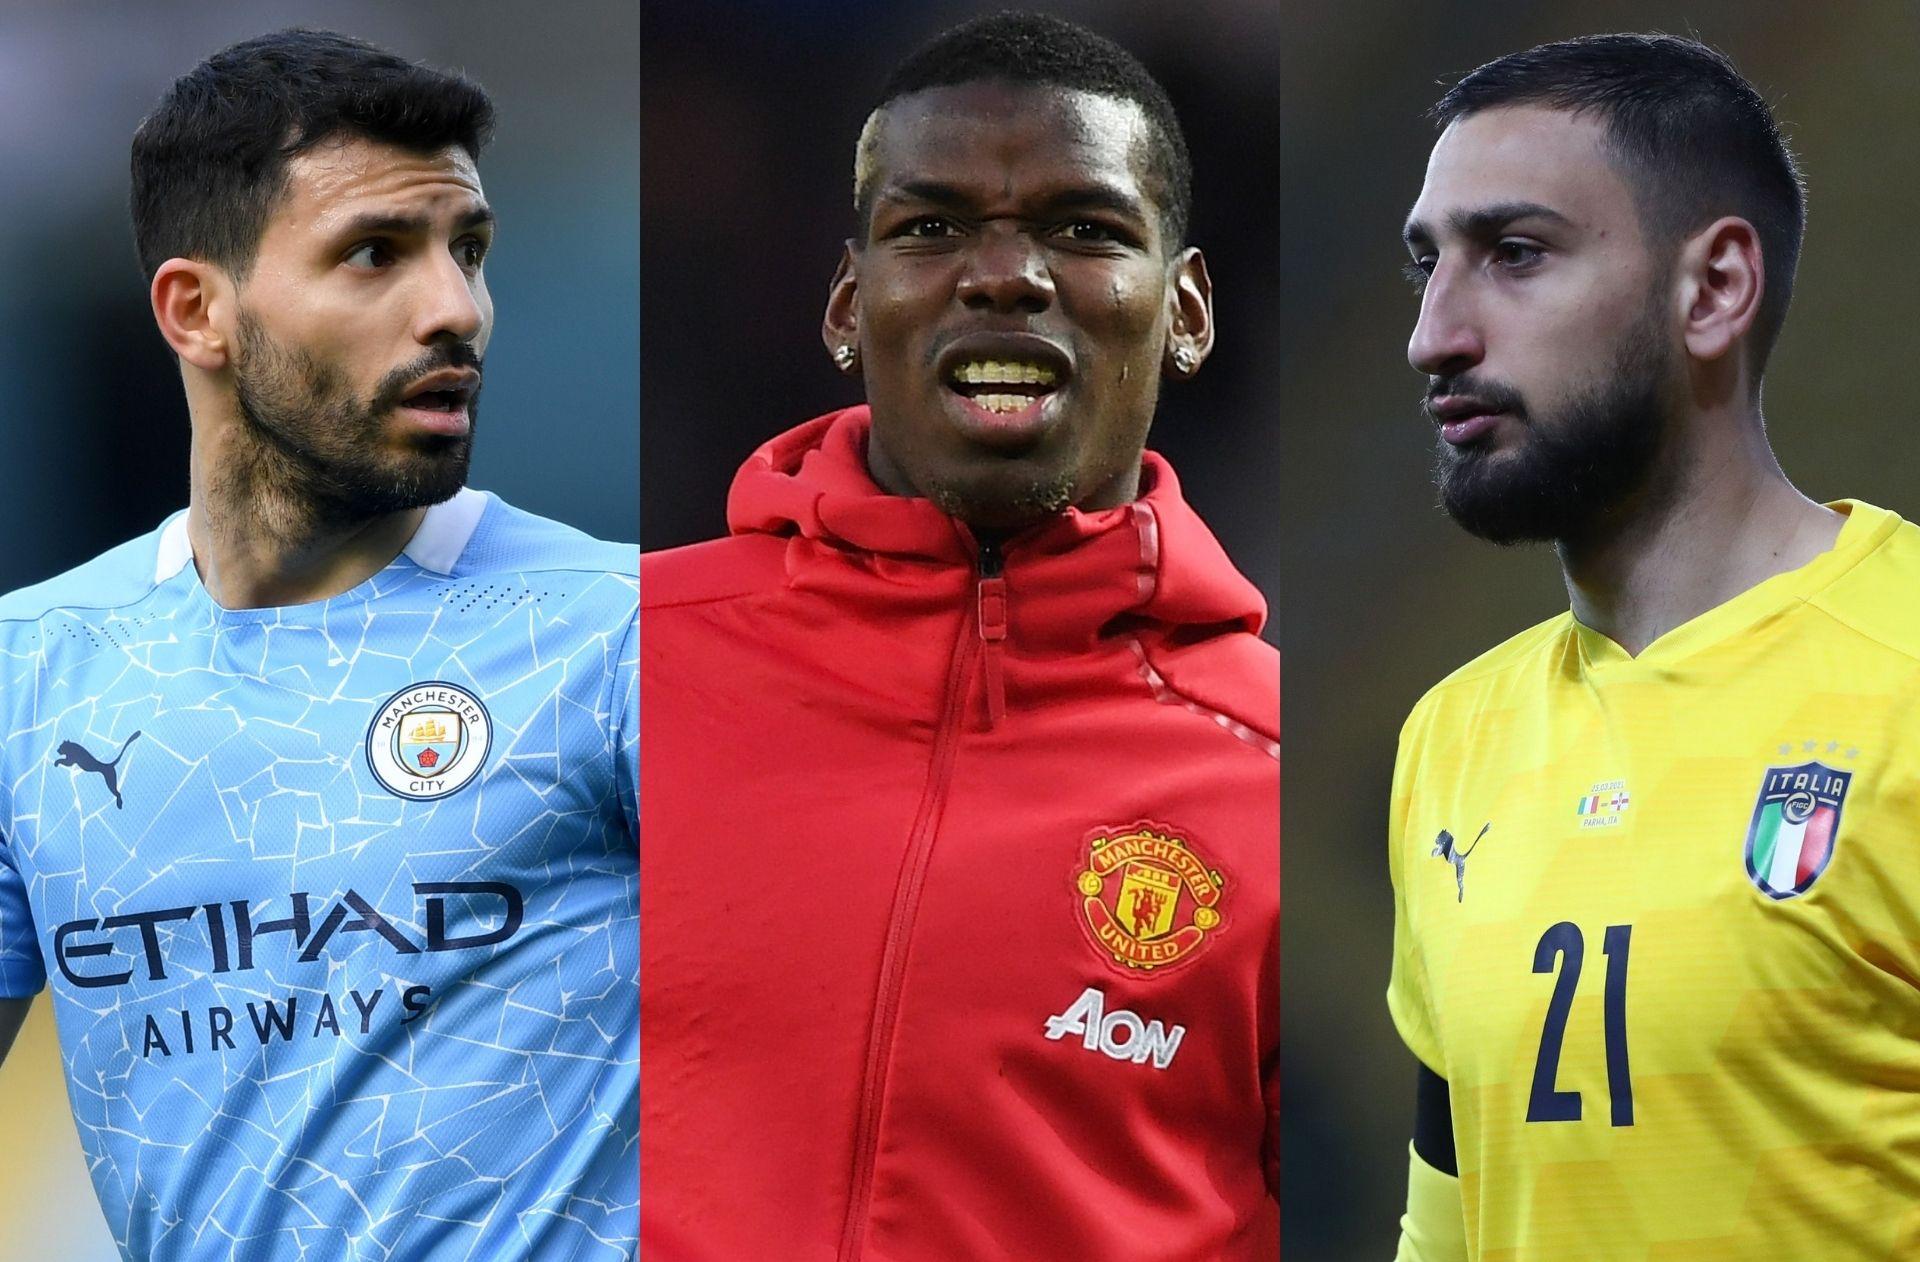 Saturday's transfer rumors - Man United make Pogba decision